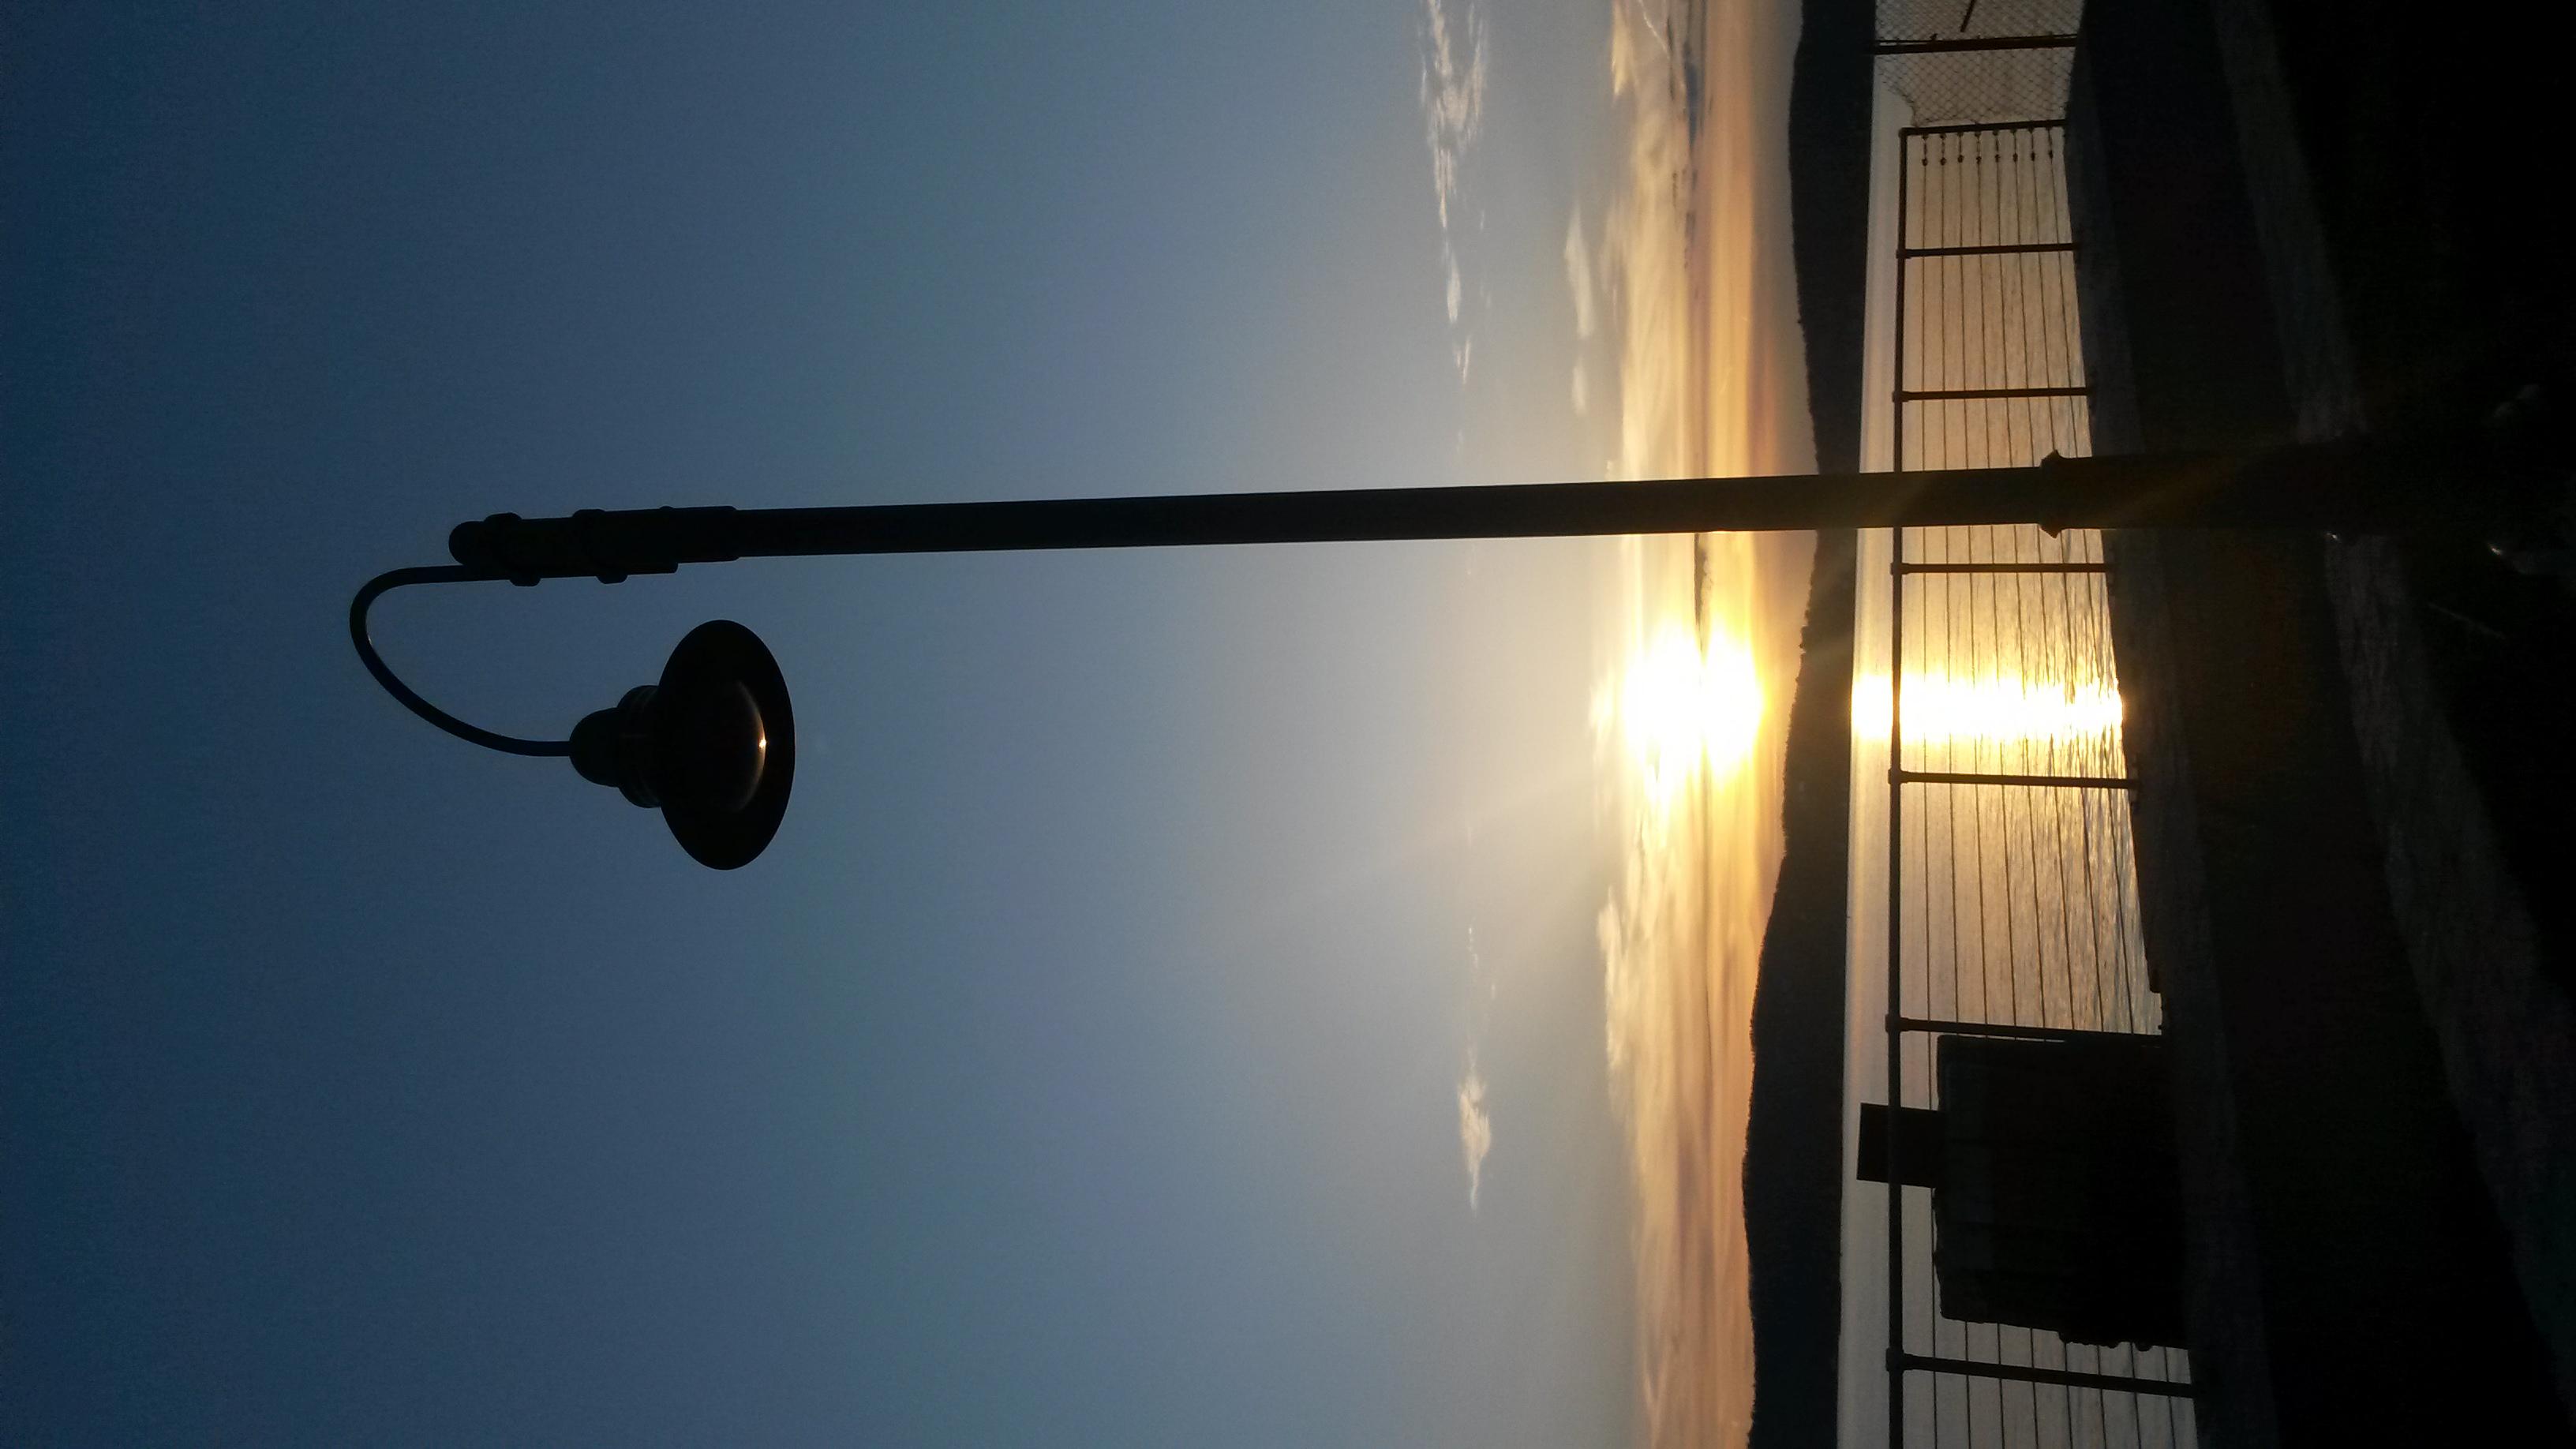 Sunset Pole